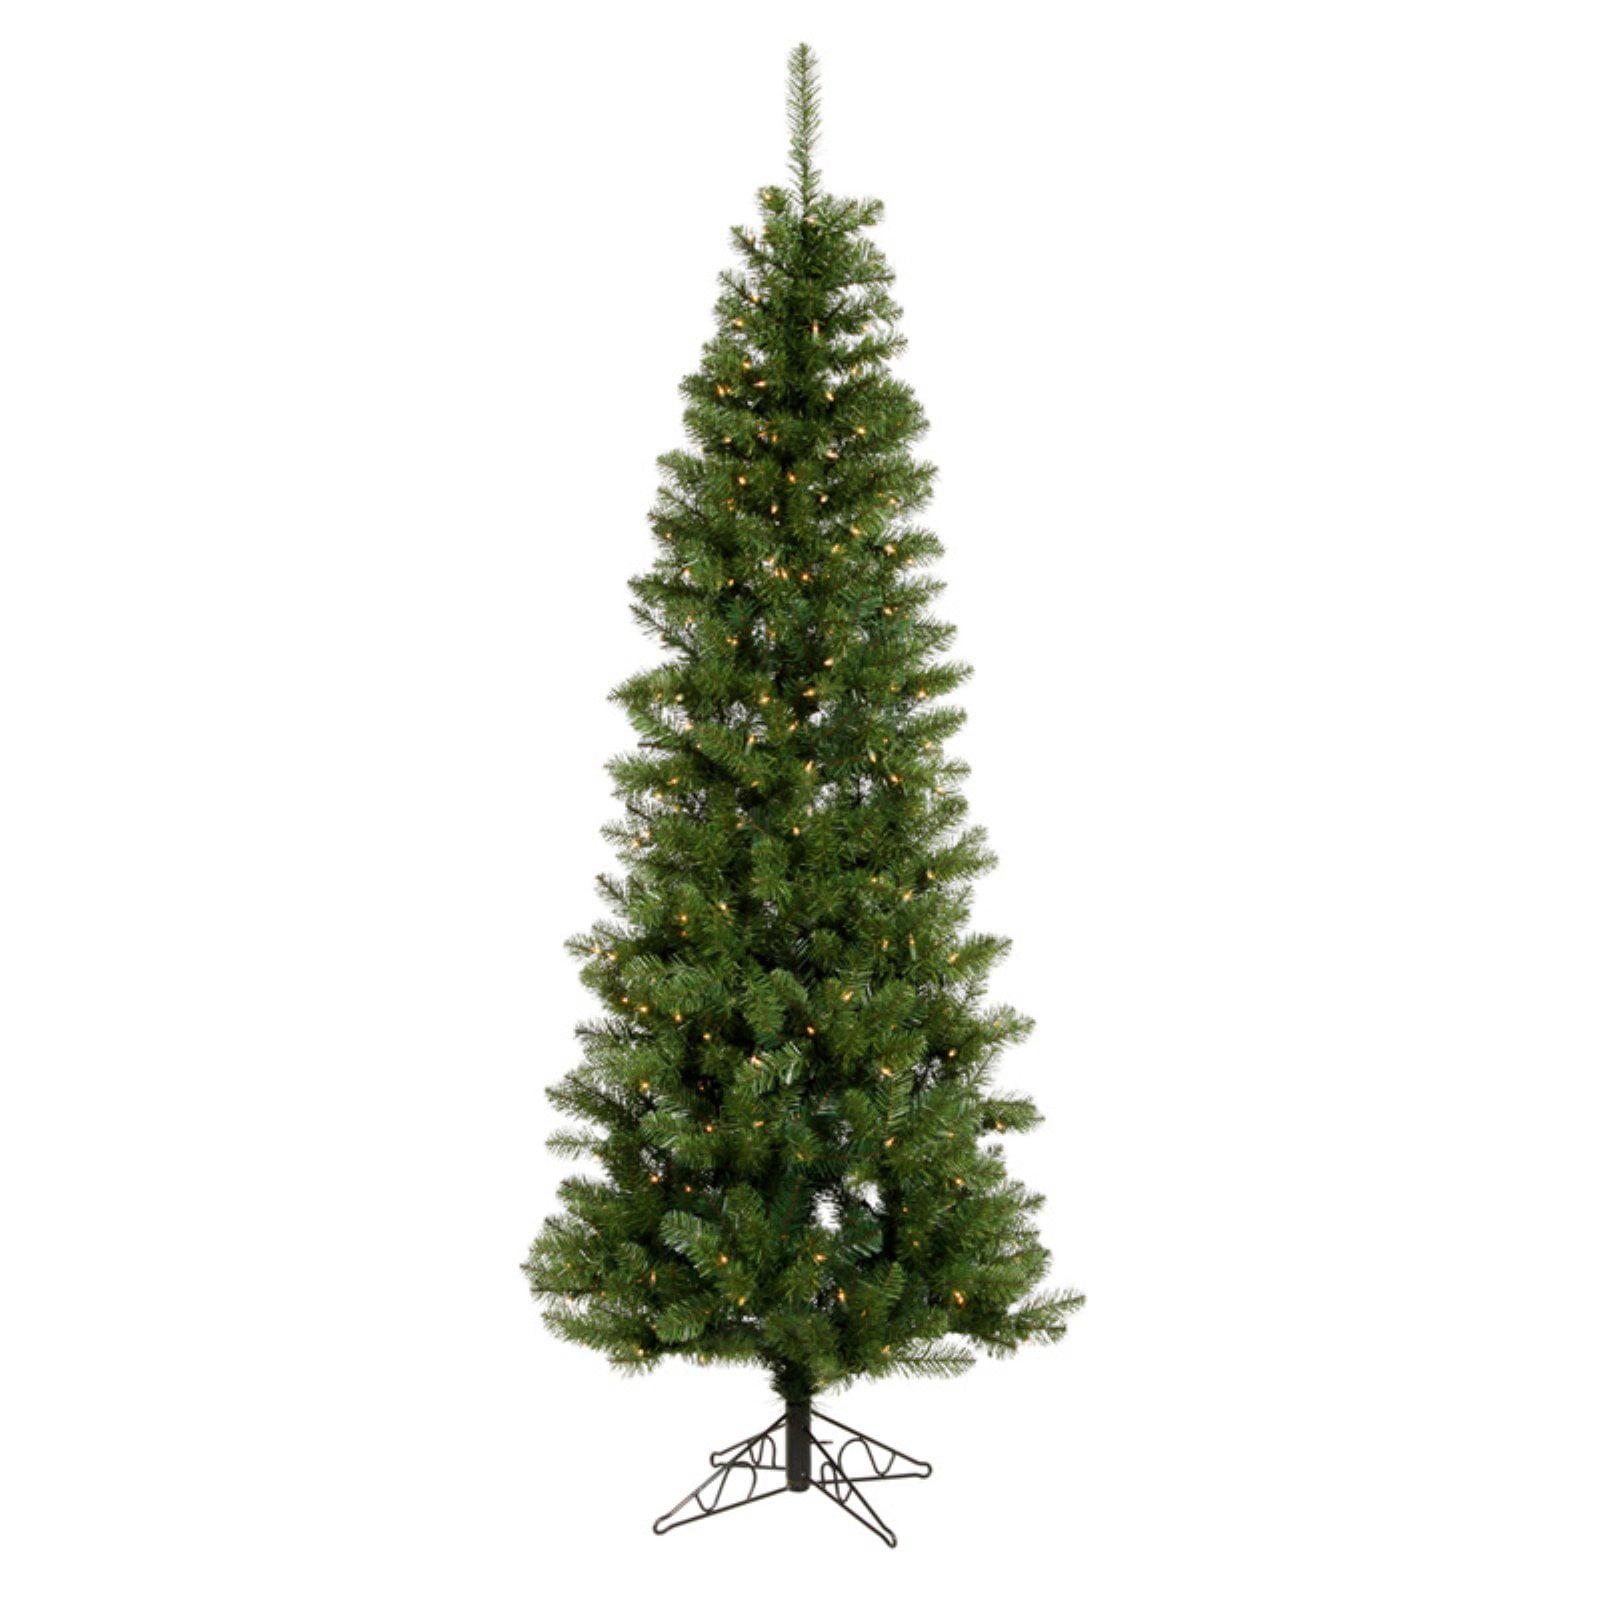 "Pre-Lit 4.5' x 24"" Salem Pencil Pine LED Artificial Christmas Tree, Green, White Lights"